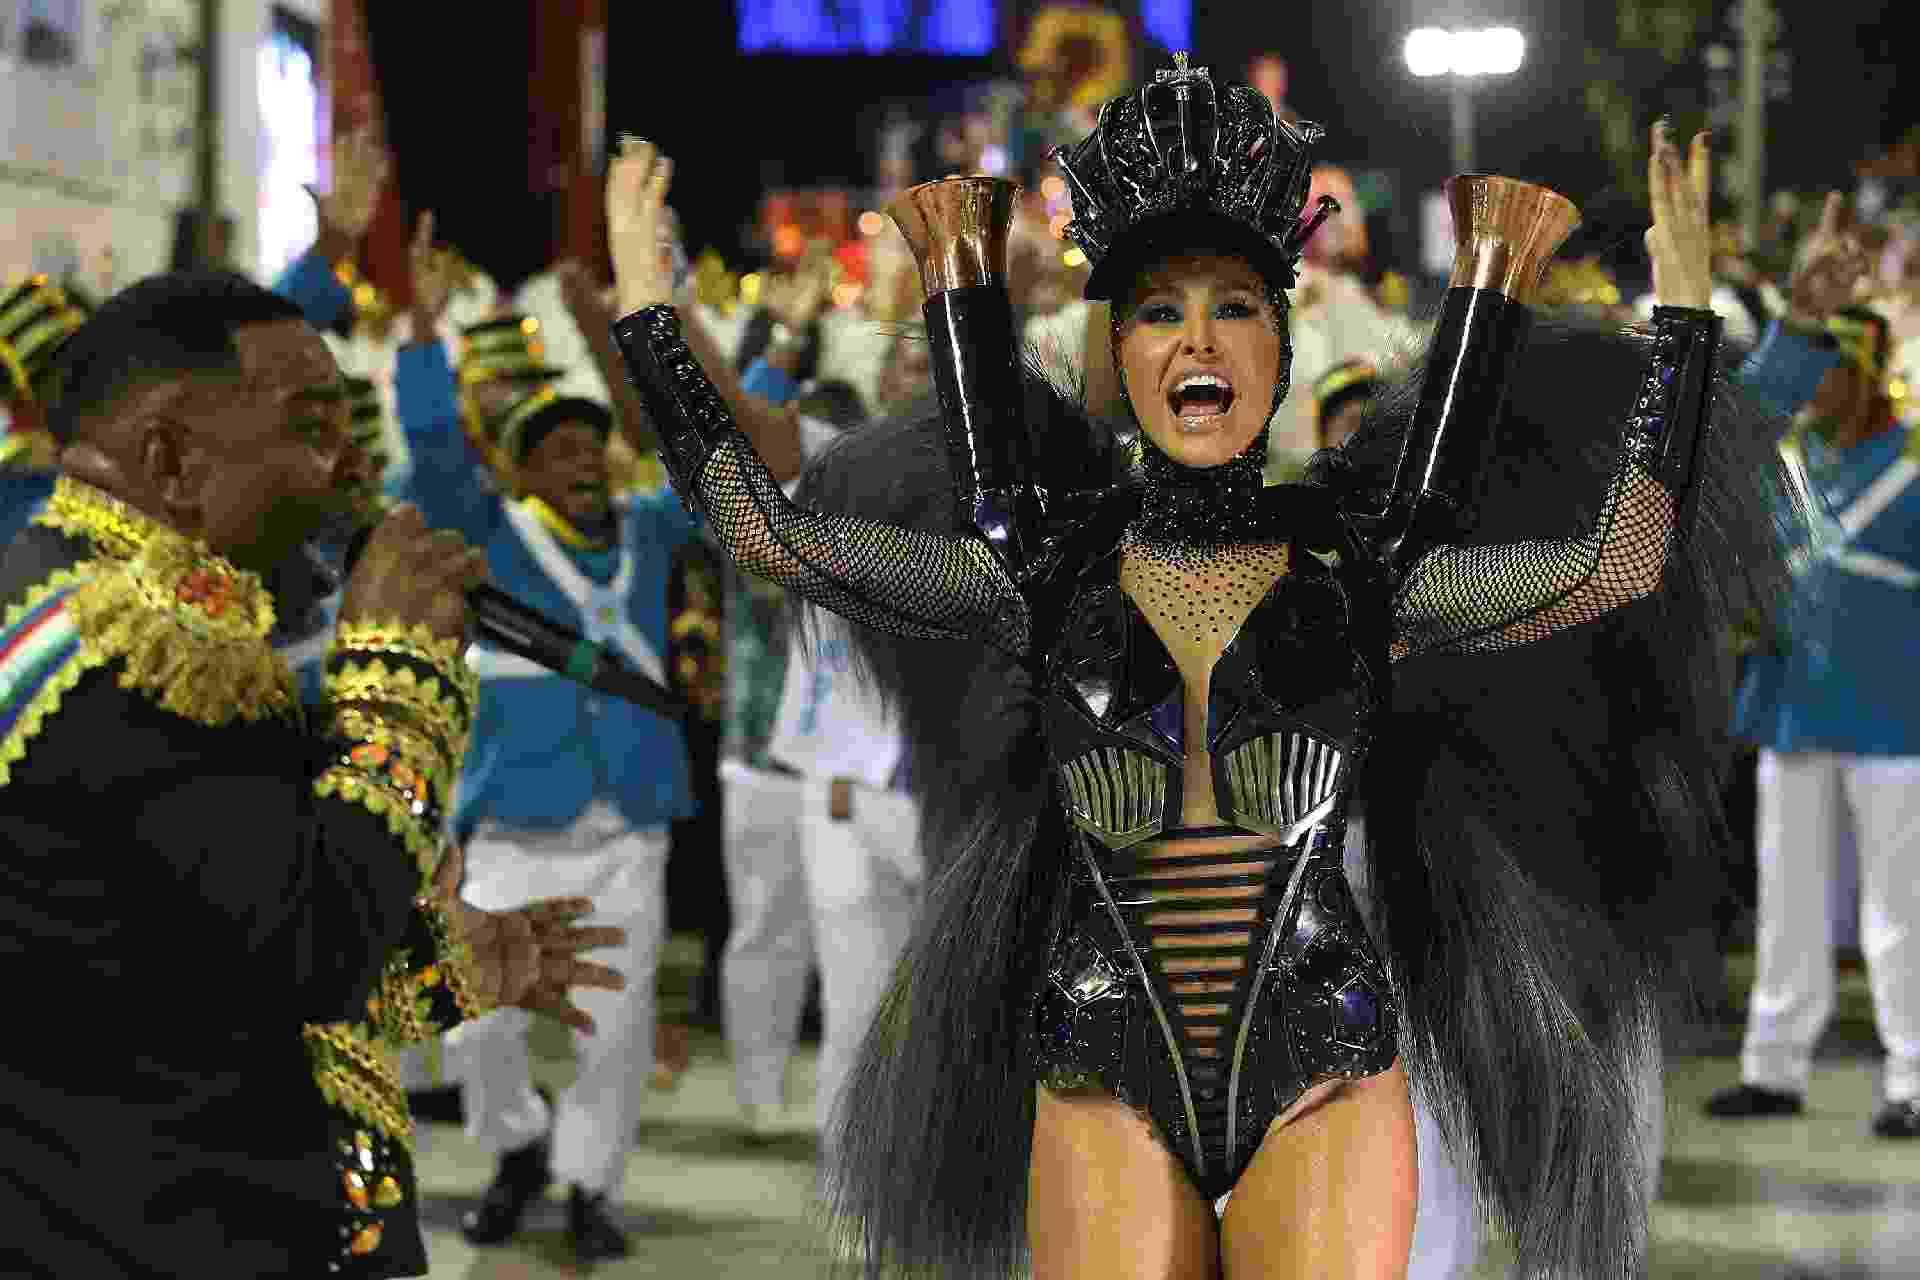 Sabrina Sato, rainha de bateria, desfila em look deslumbrante - Júlio César Guimarães/UOL